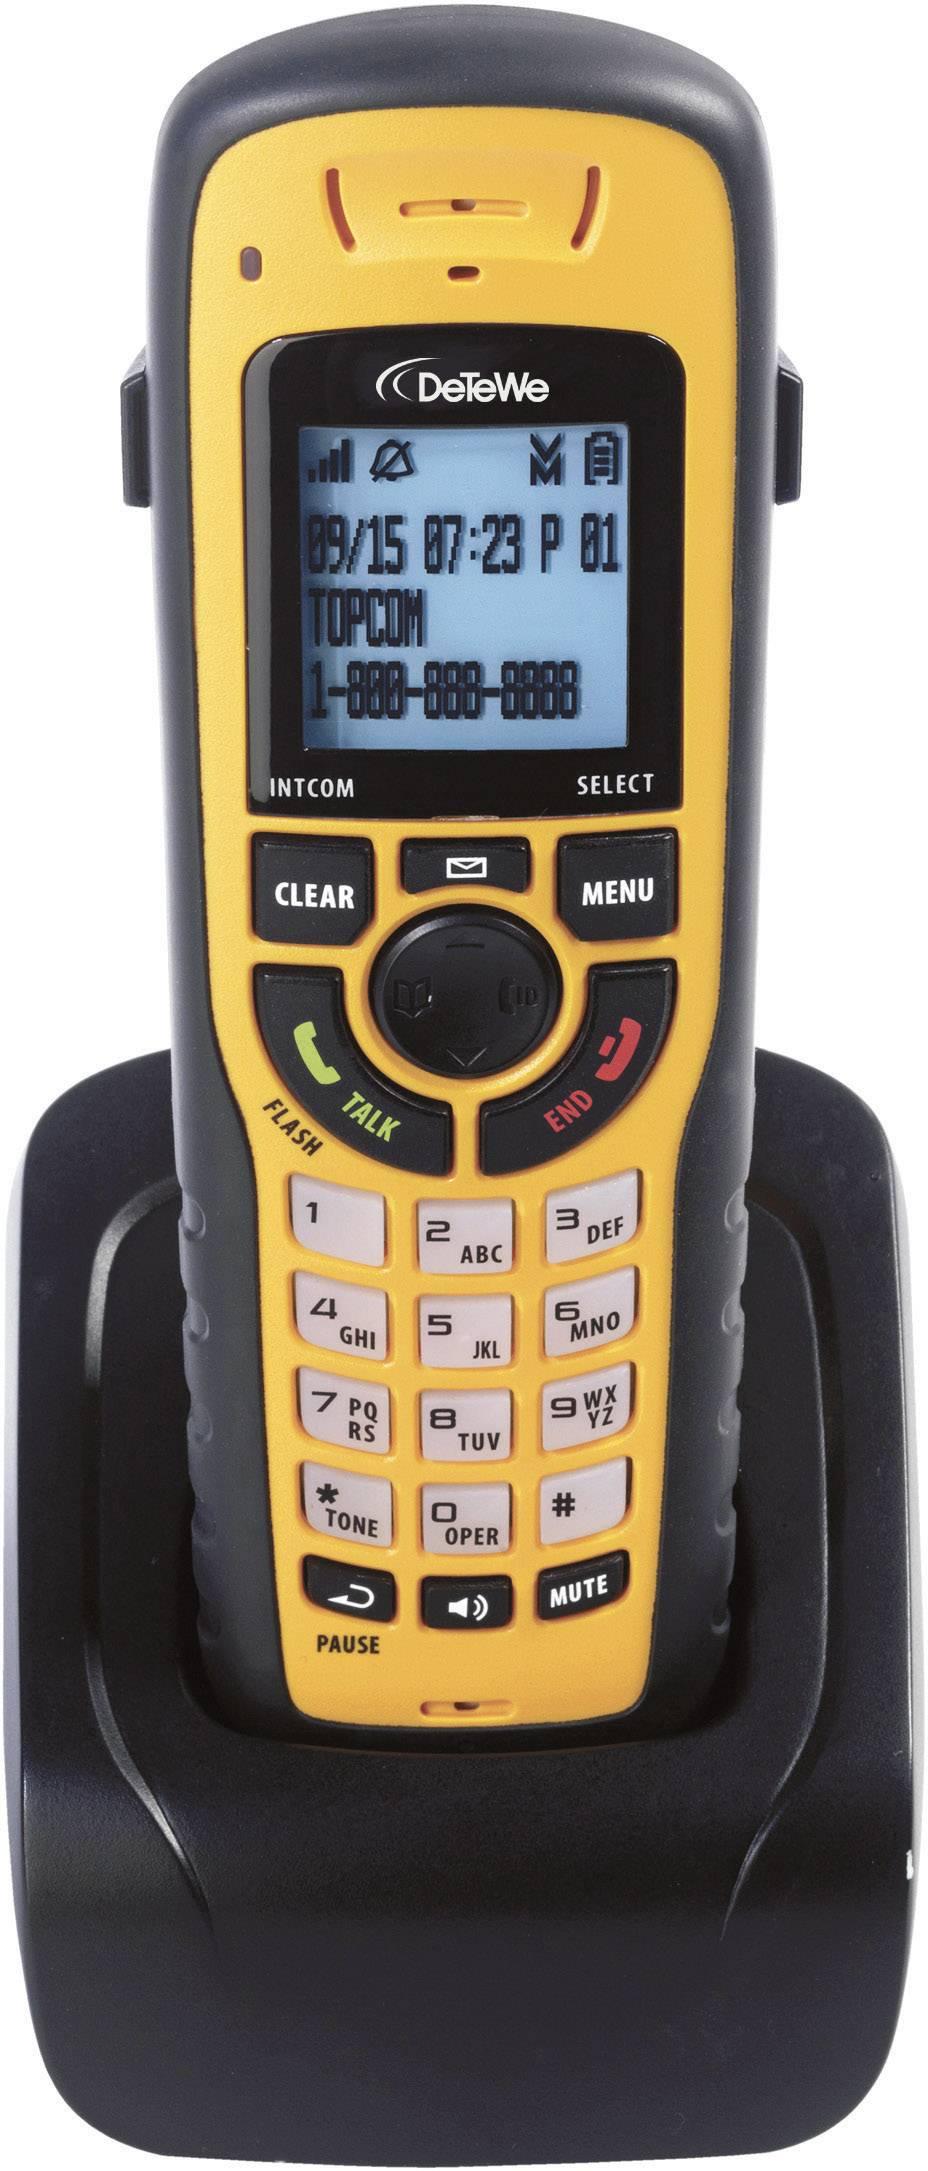 Téléphone DeTeWe BeeTel 2000c